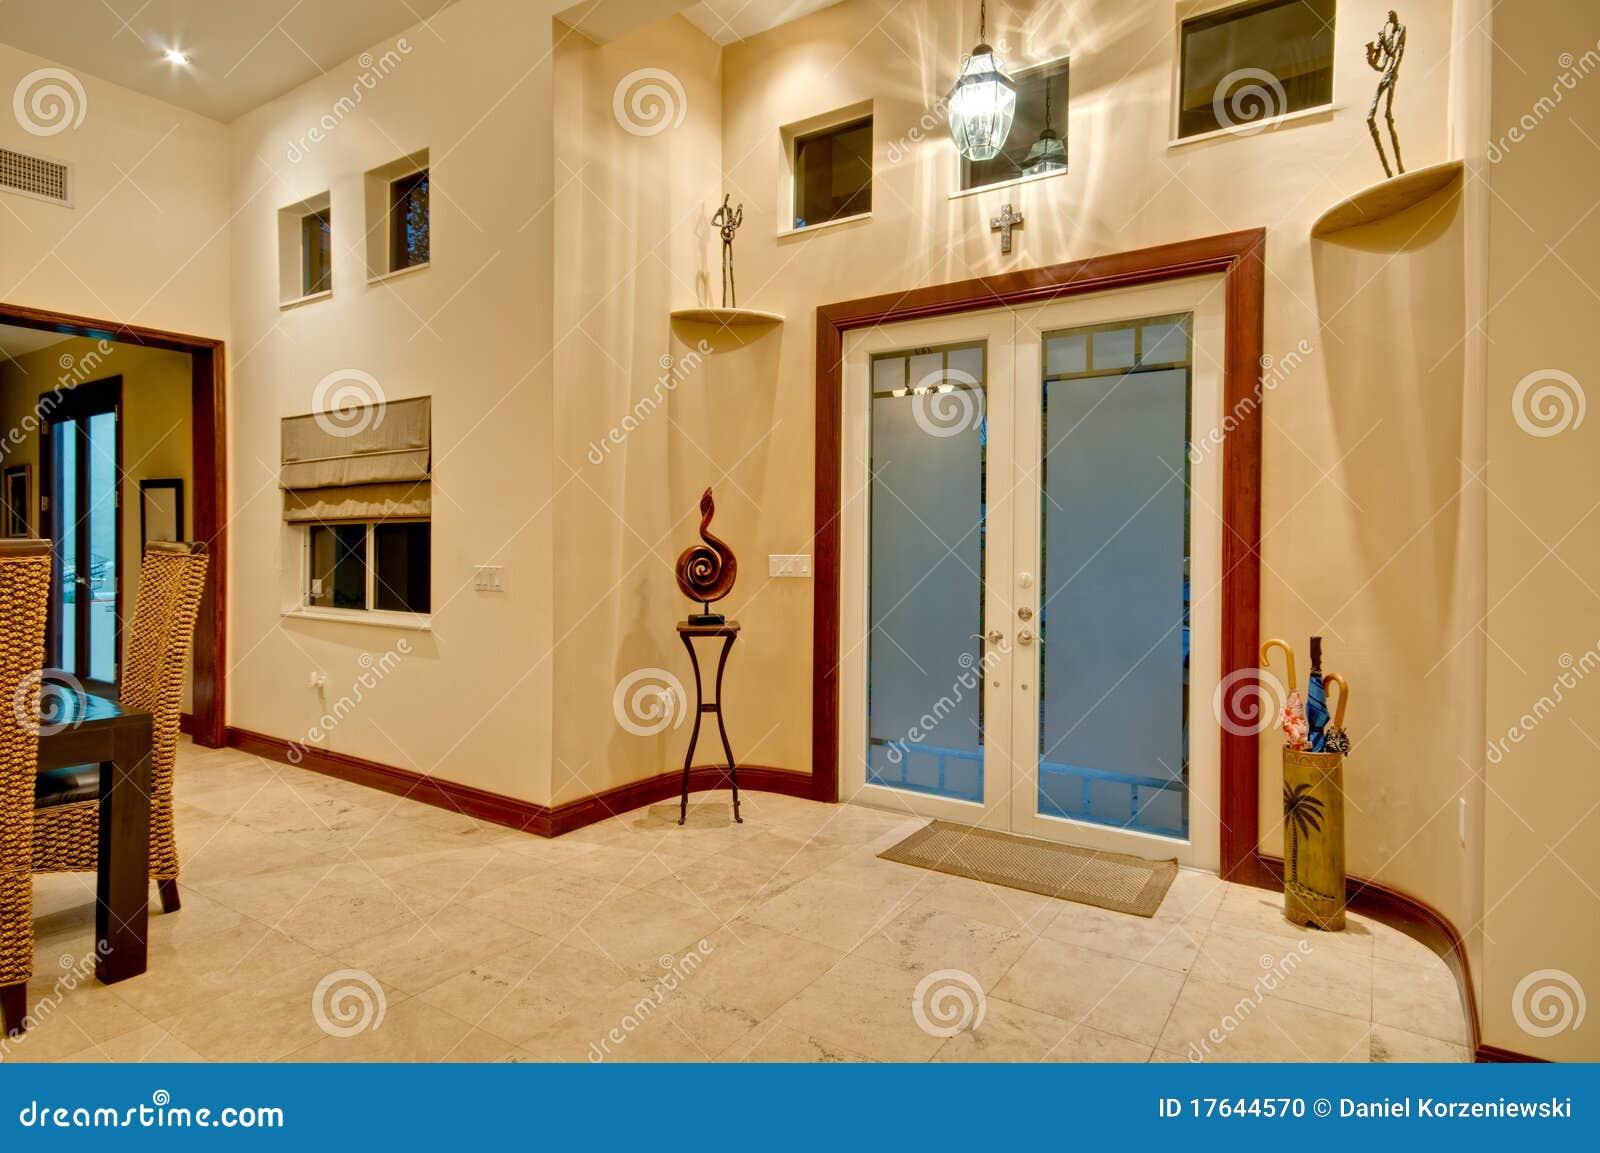 Home Entrance modern home entrance stock images - image: 25700164